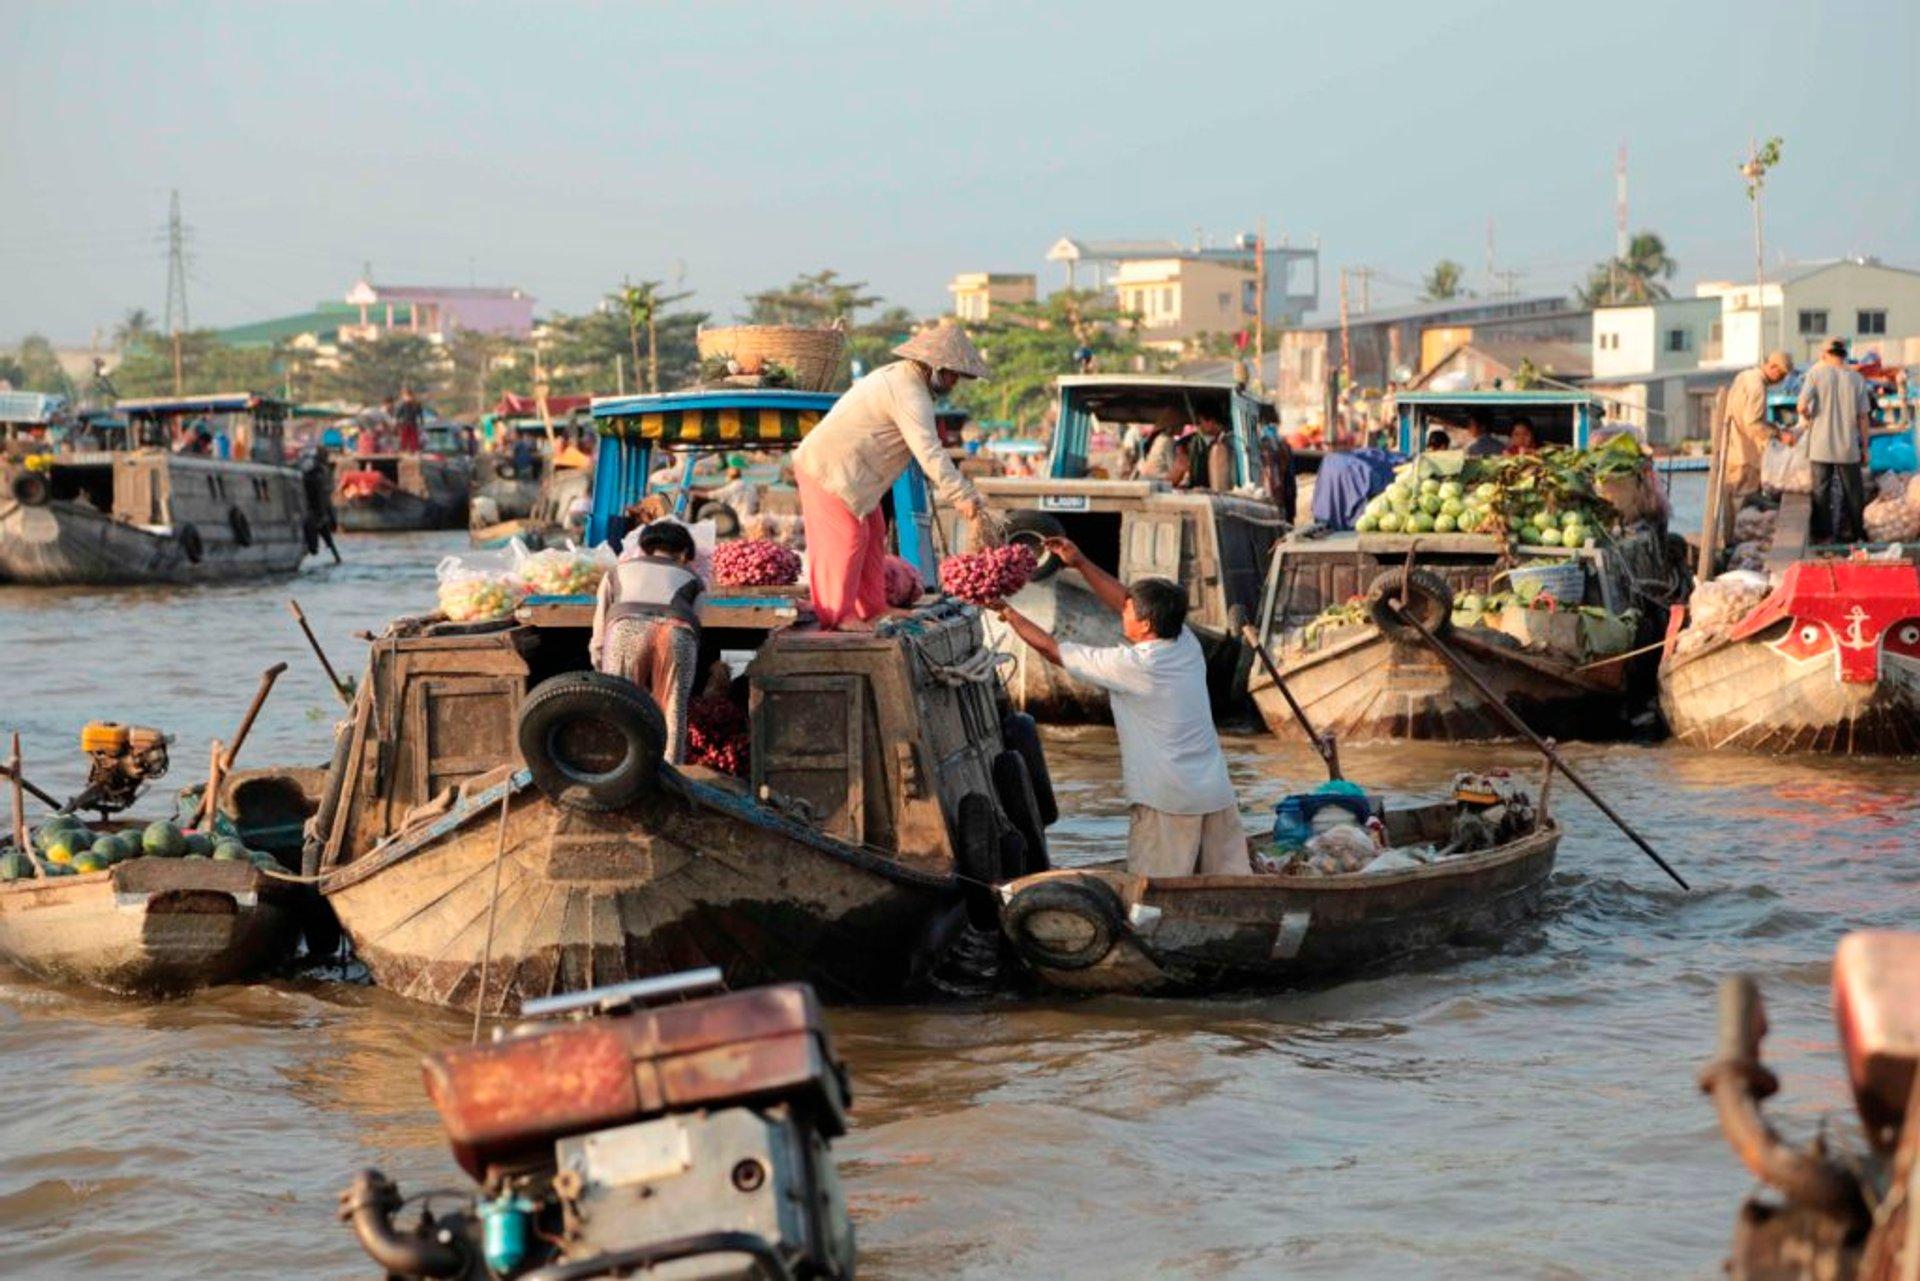 Mekong River Boat Trip in Cambodia - Best Season 2019